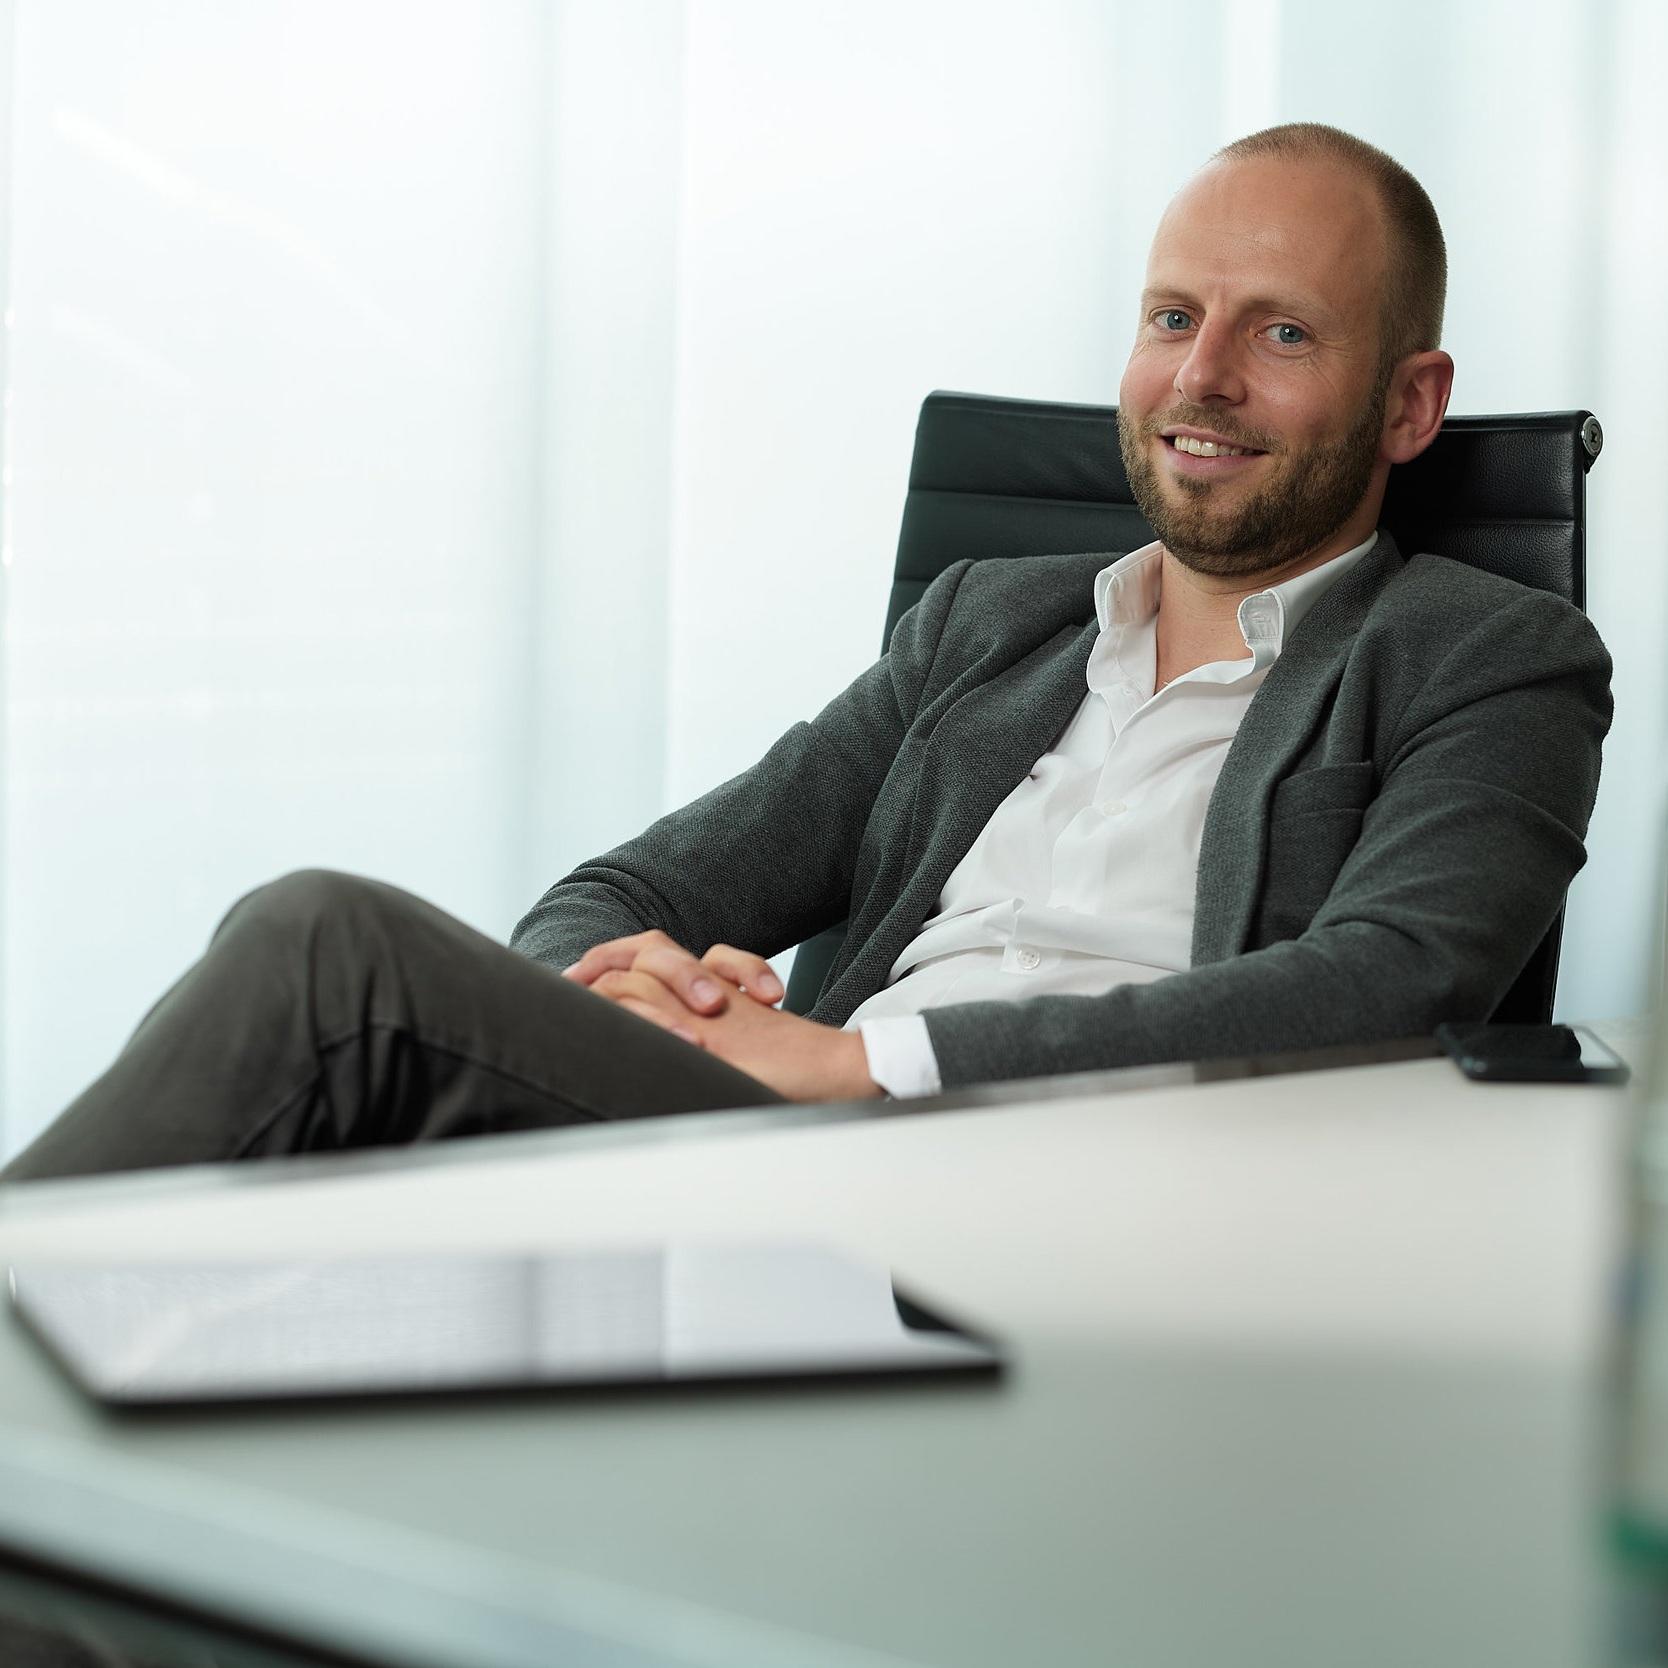 Daniel Vonier - Global Vice President People & Organizational Growth, SAP